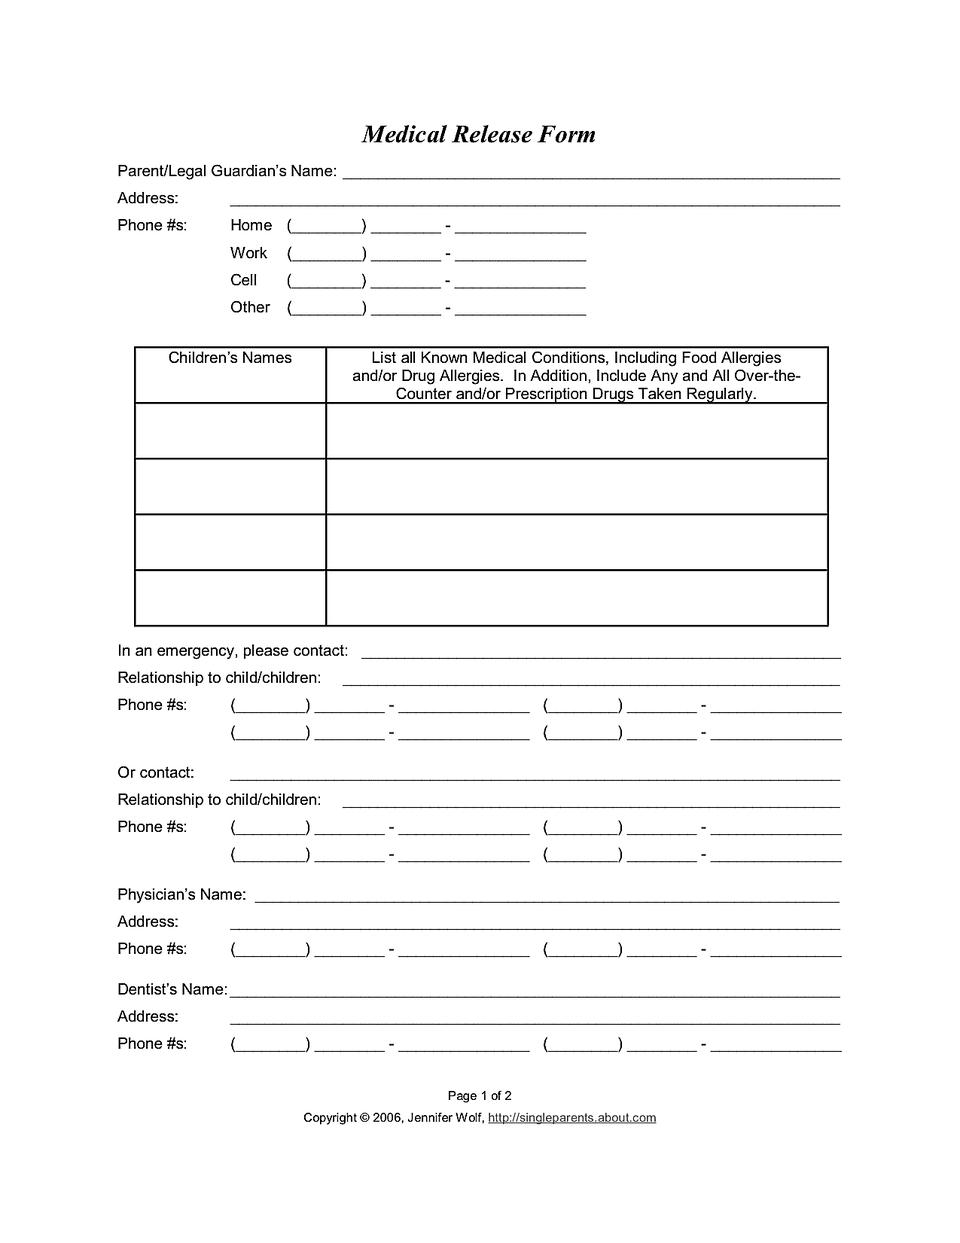 Medical Release Form For - Free Printable Medical Release Form